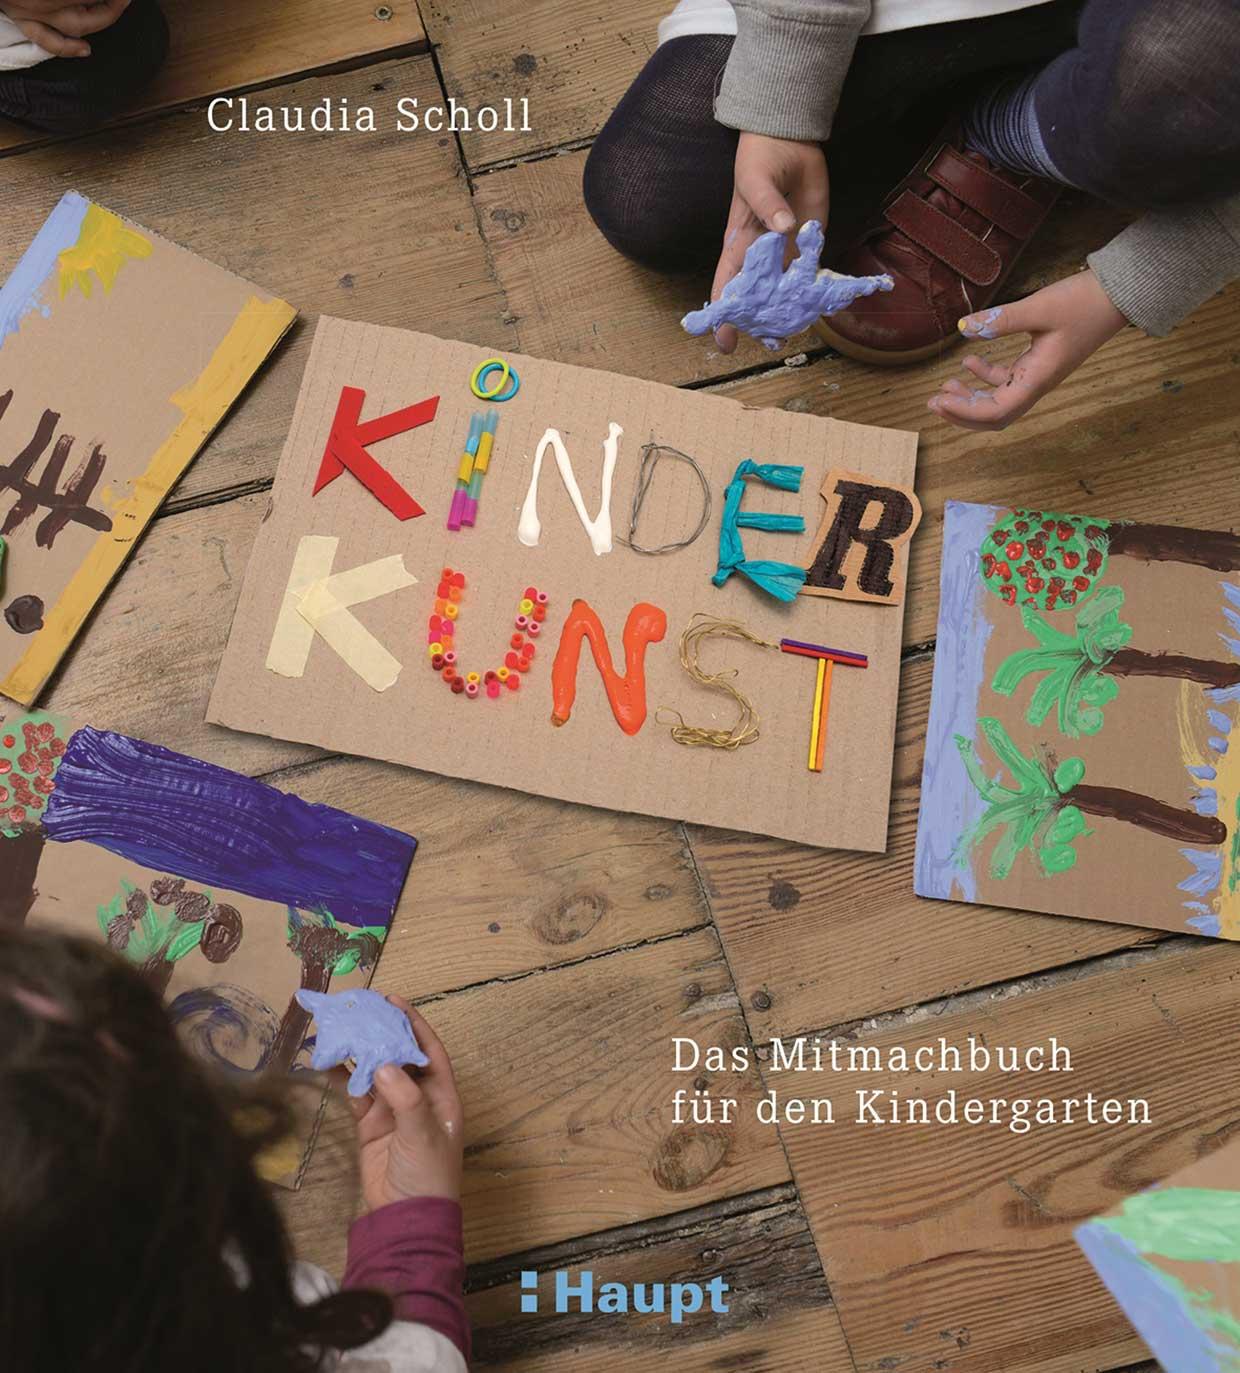 haupt_claudia-scholl_kinderkunst-h